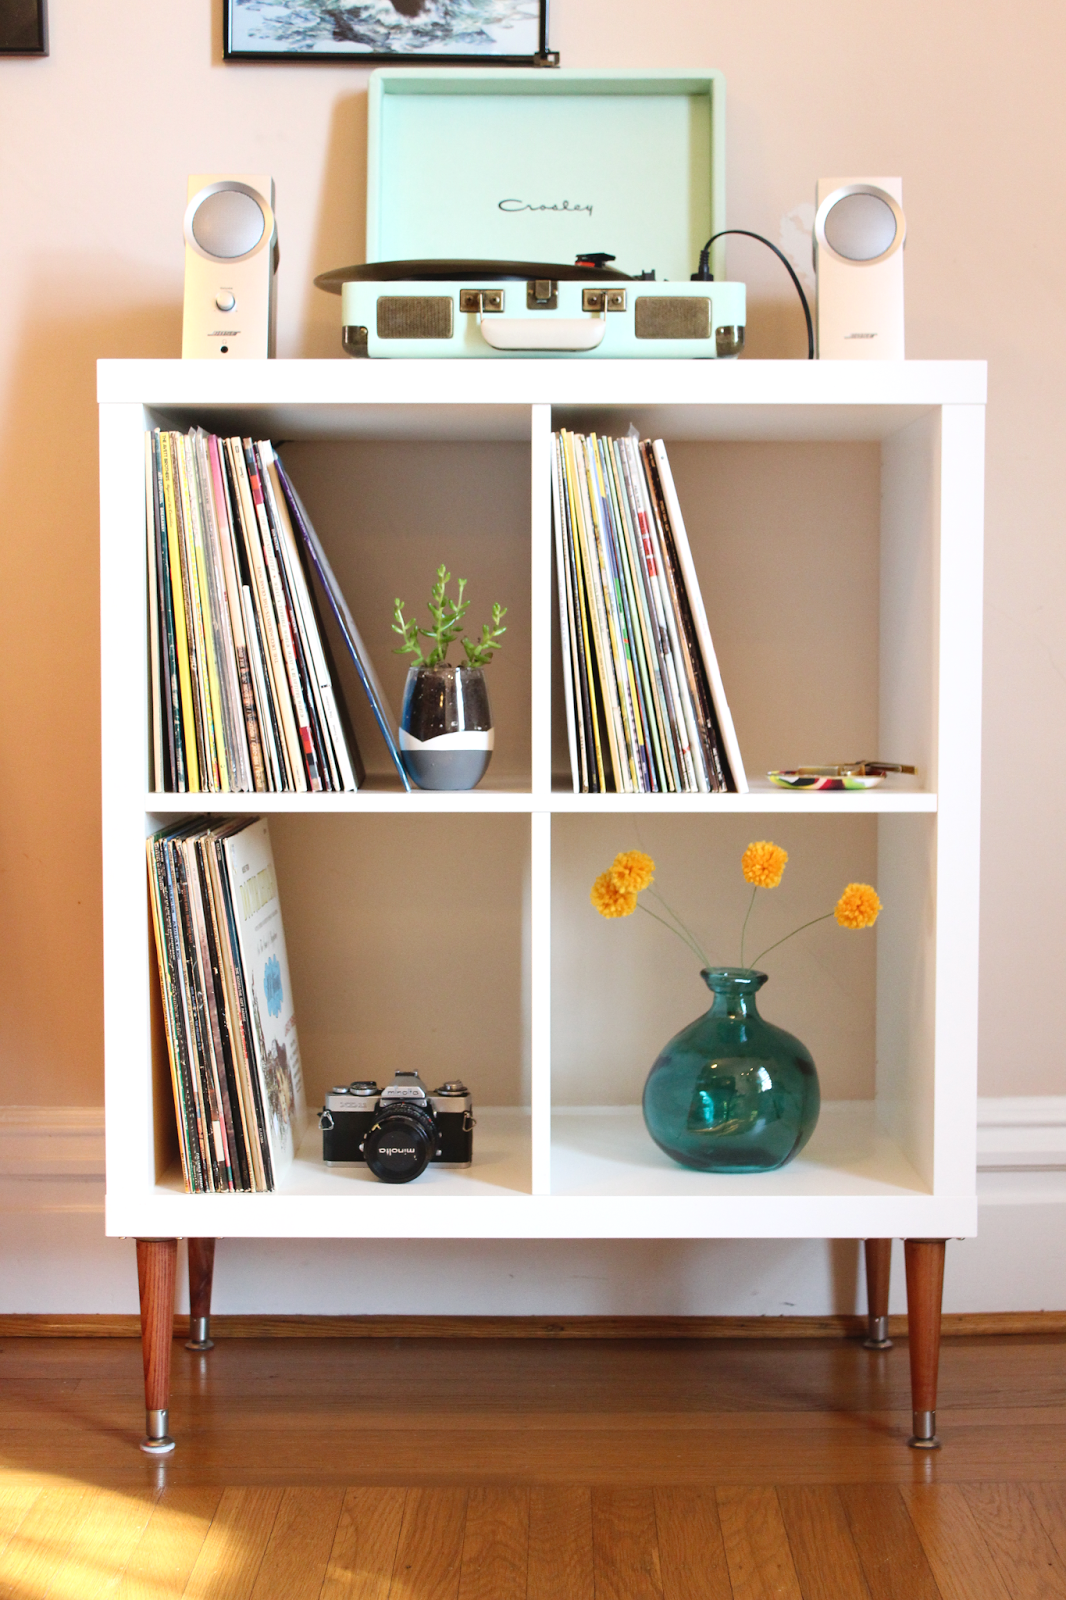 Diy Vinyl Record Stand From A Kallax Bookshelf Via Www Thesurznickcommonroom